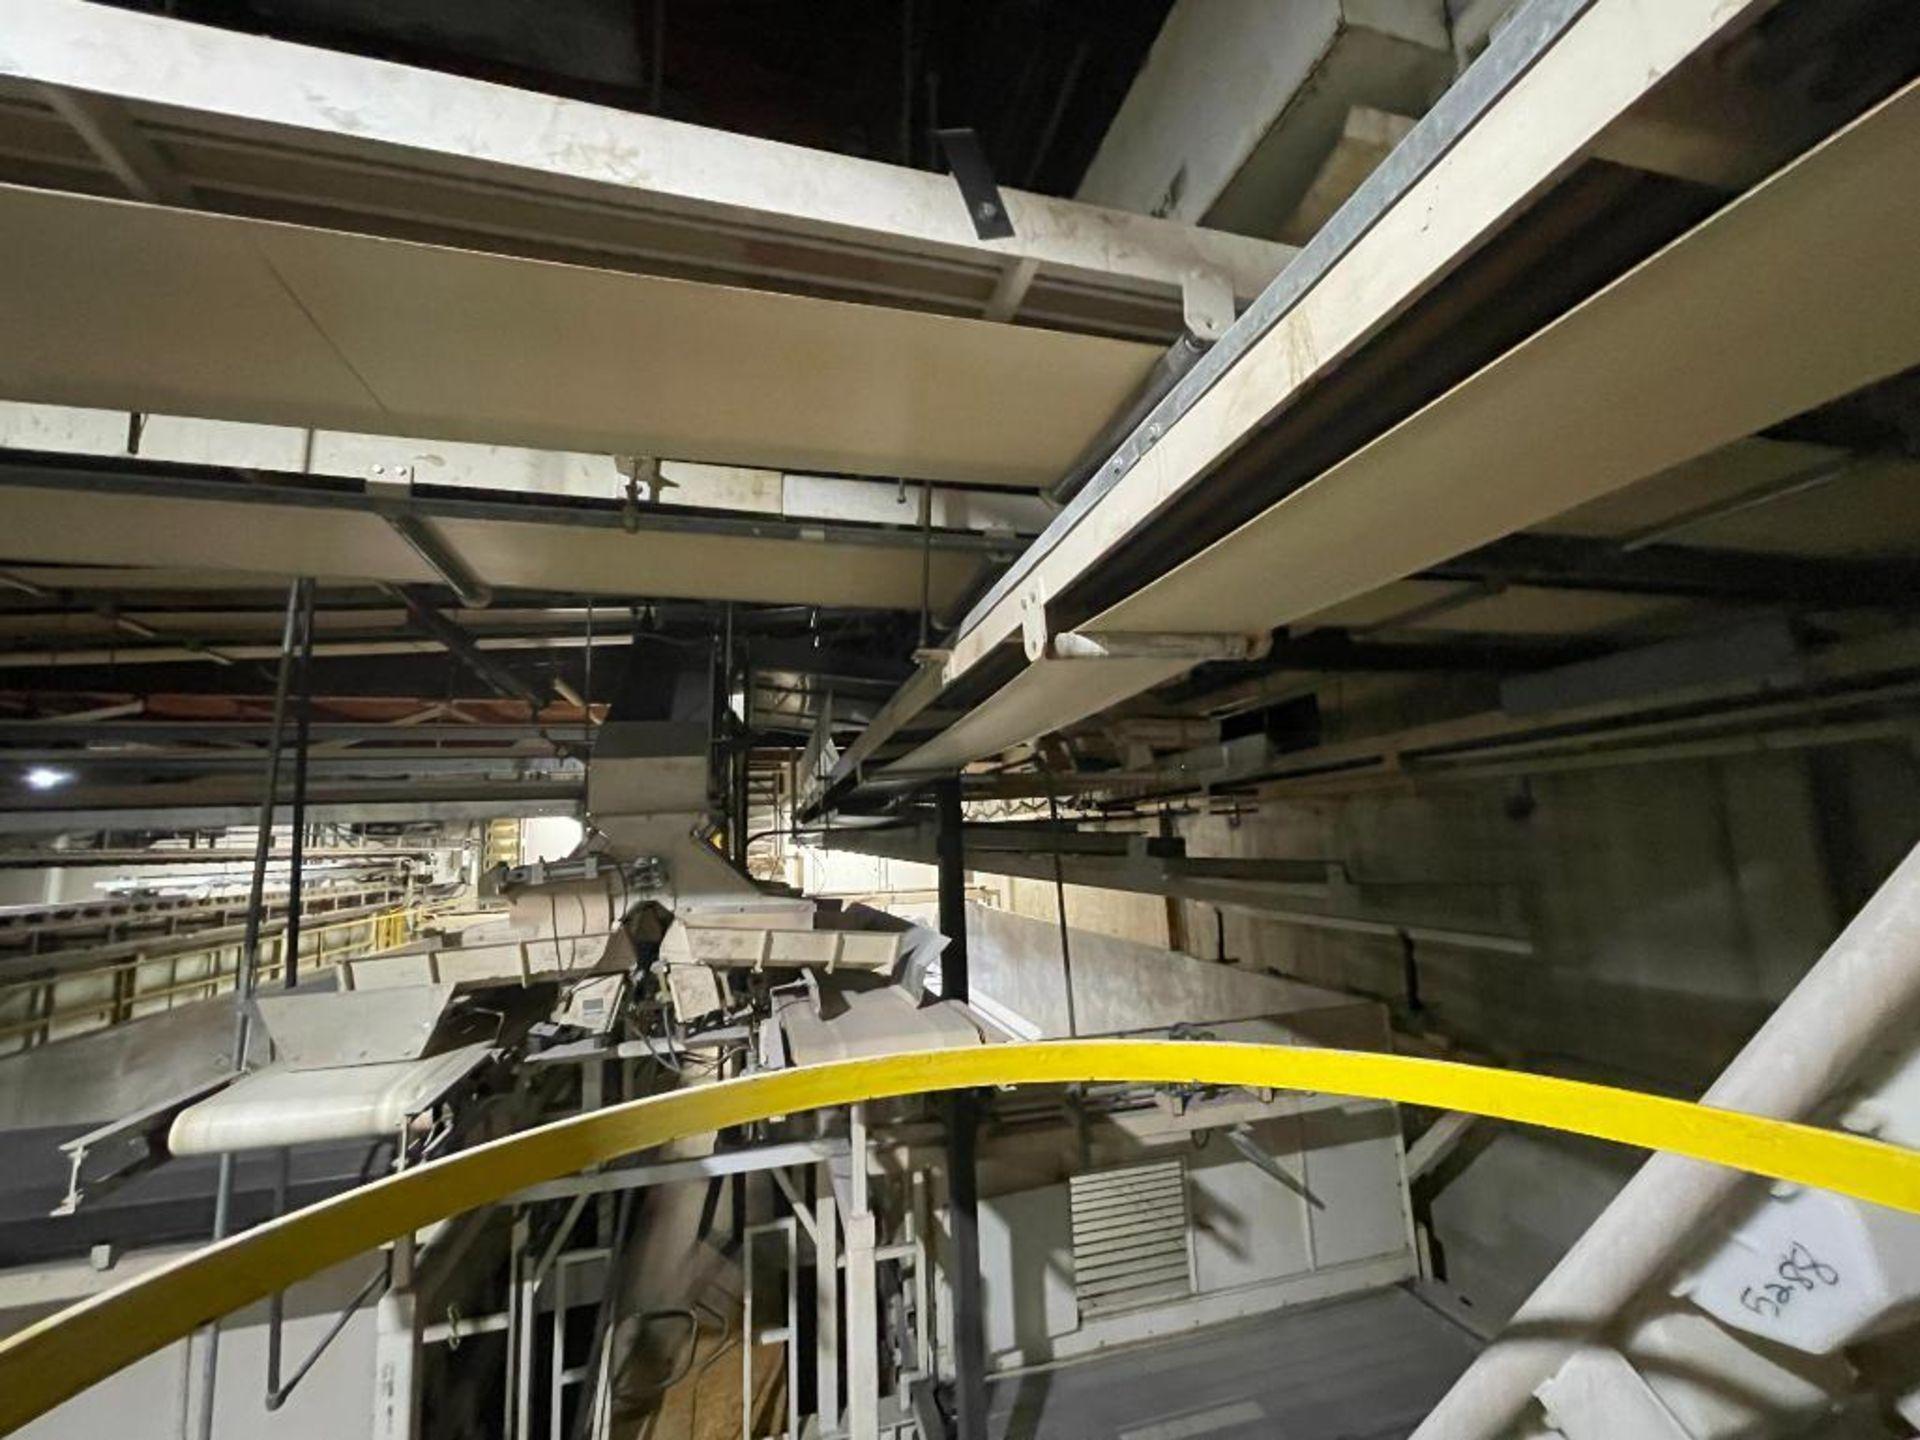 2 Aseeco horizontal overhead mild steel belt conveyors - Image 5 of 9